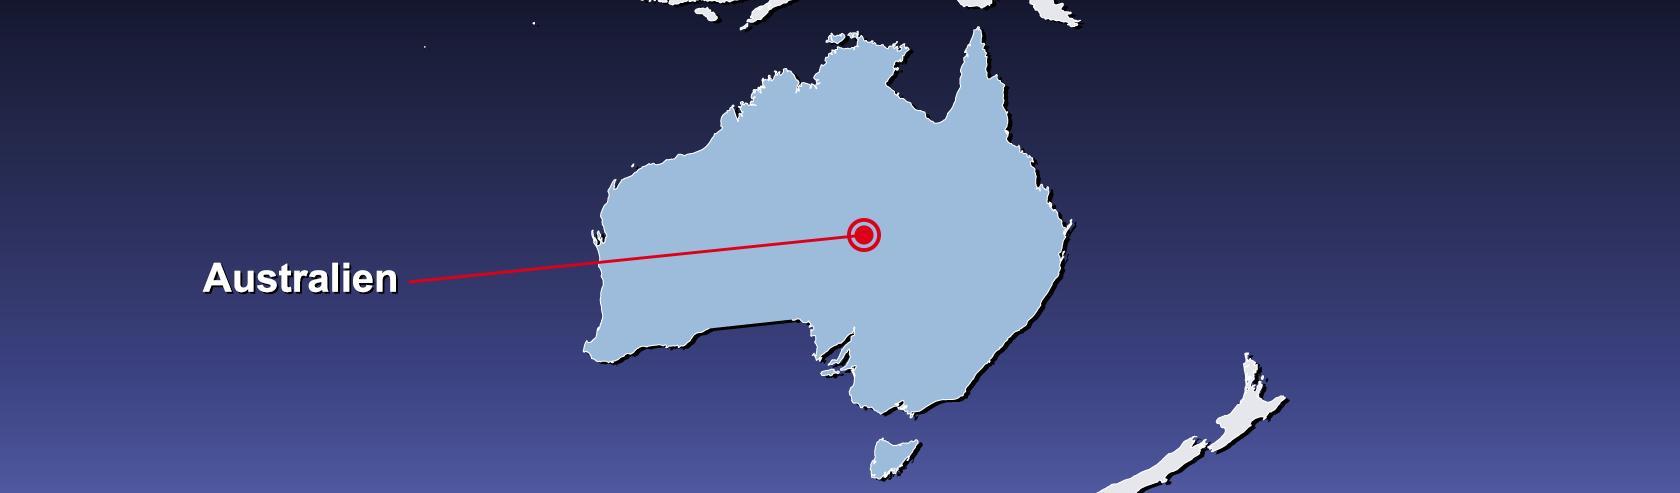 Transport-Australien